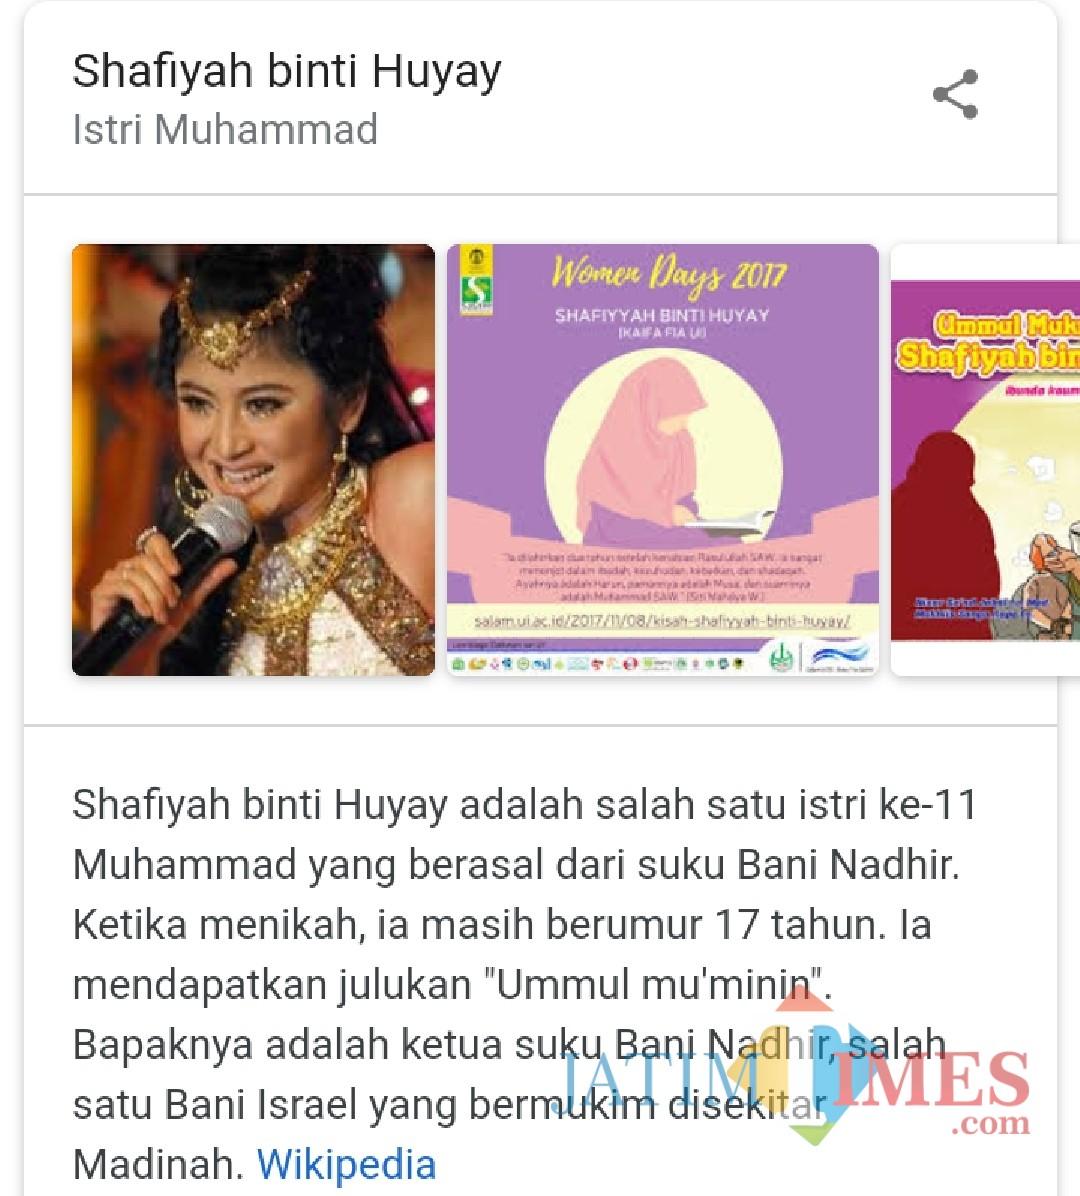 Foto Dewi Persik yang disematkan dalam biodata istri Nabi Muhammad SAW bernama Shafiyah binti Huyay. (screenshot google)